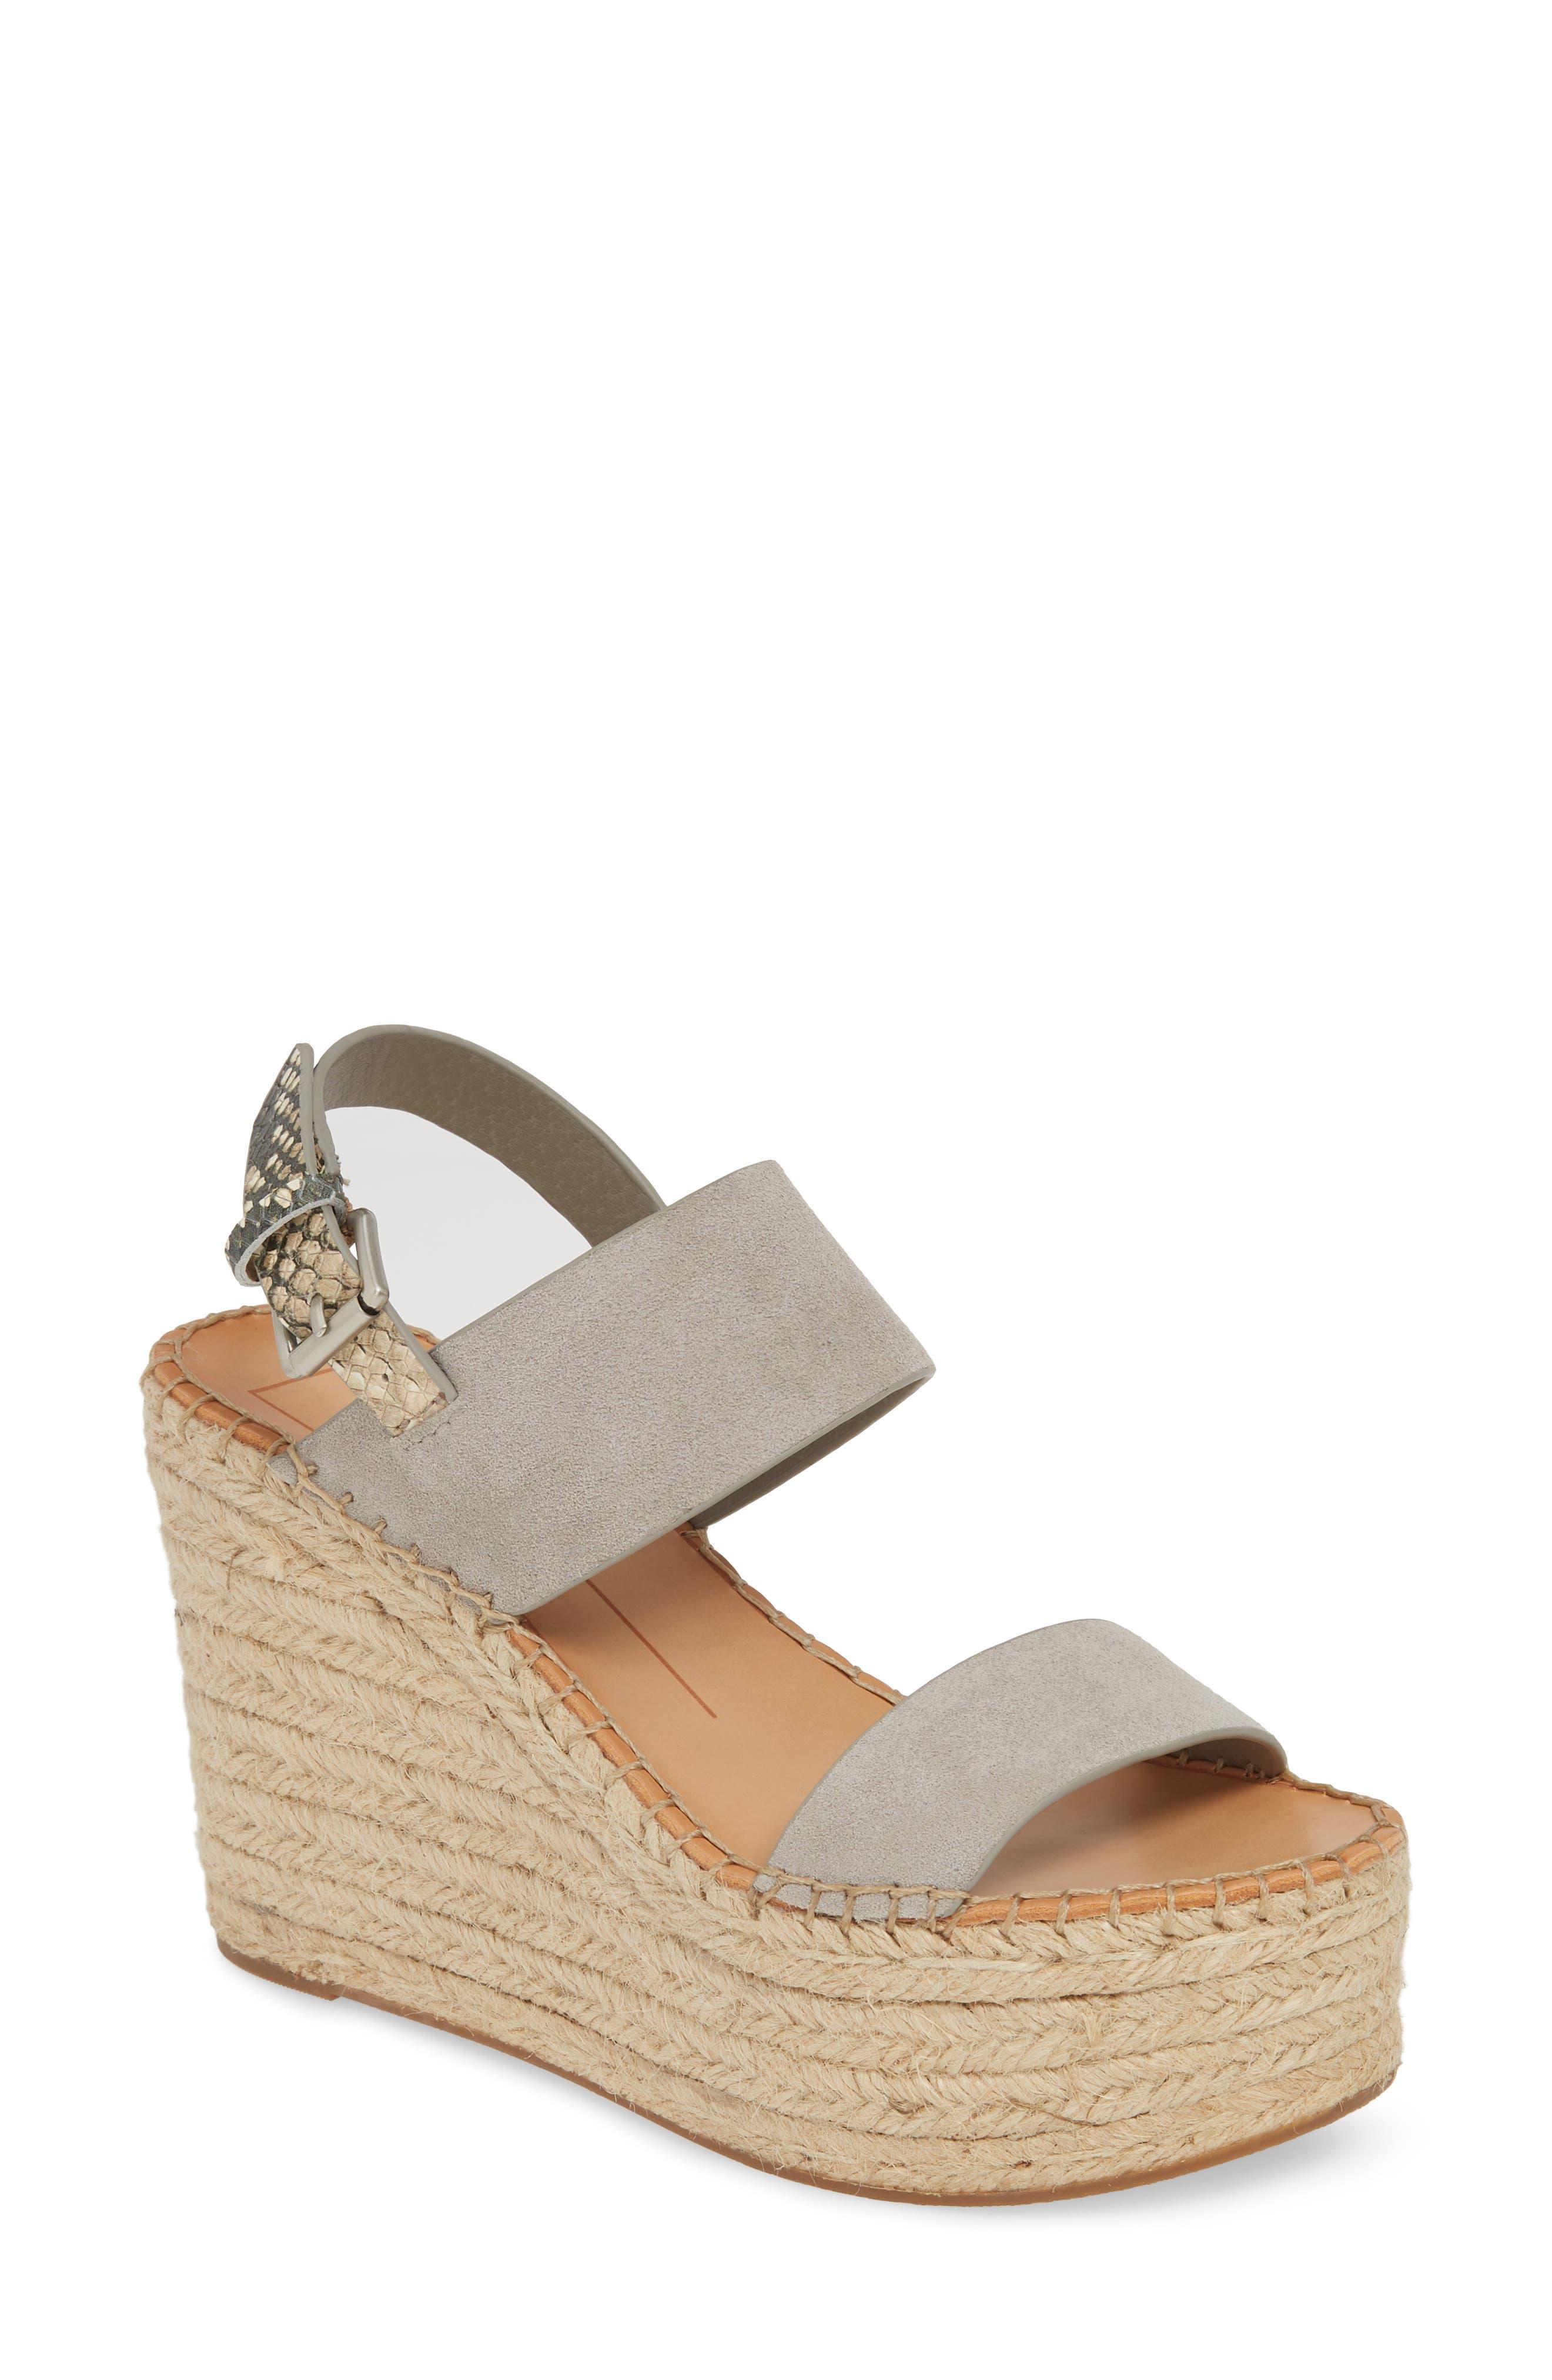 Dolce Vita Spiro Platform Wedge Sandal, Grey